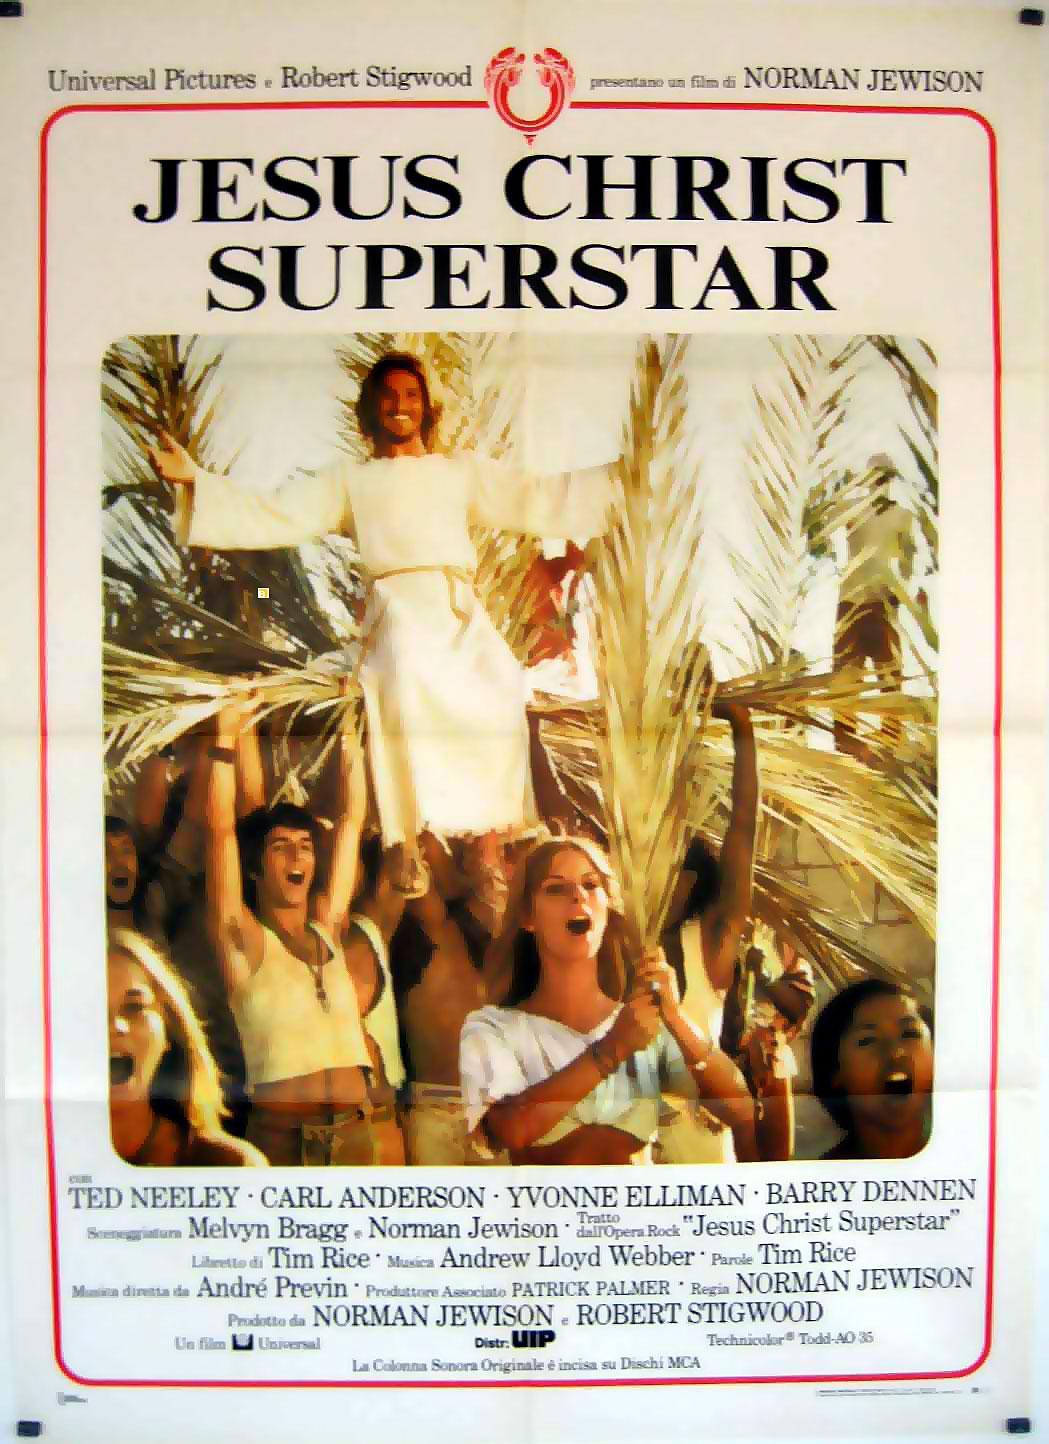 JESUS CHRIST SUPERSTAR MOVIE POSTER/JESUS CHRIST SUPERSTAR/POSTER